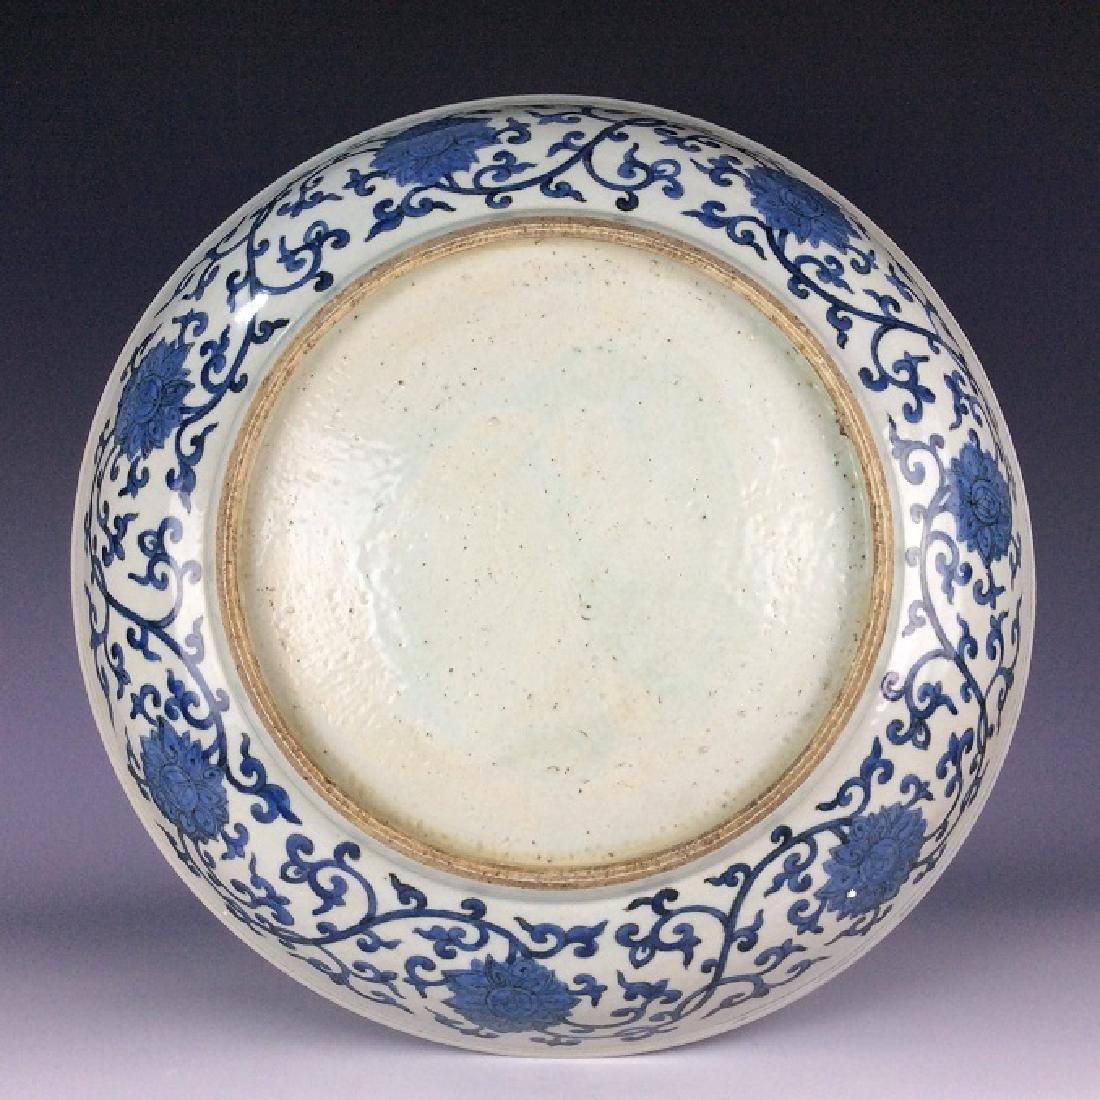 Rare Chinese porcelain plate, blue & white glaze,